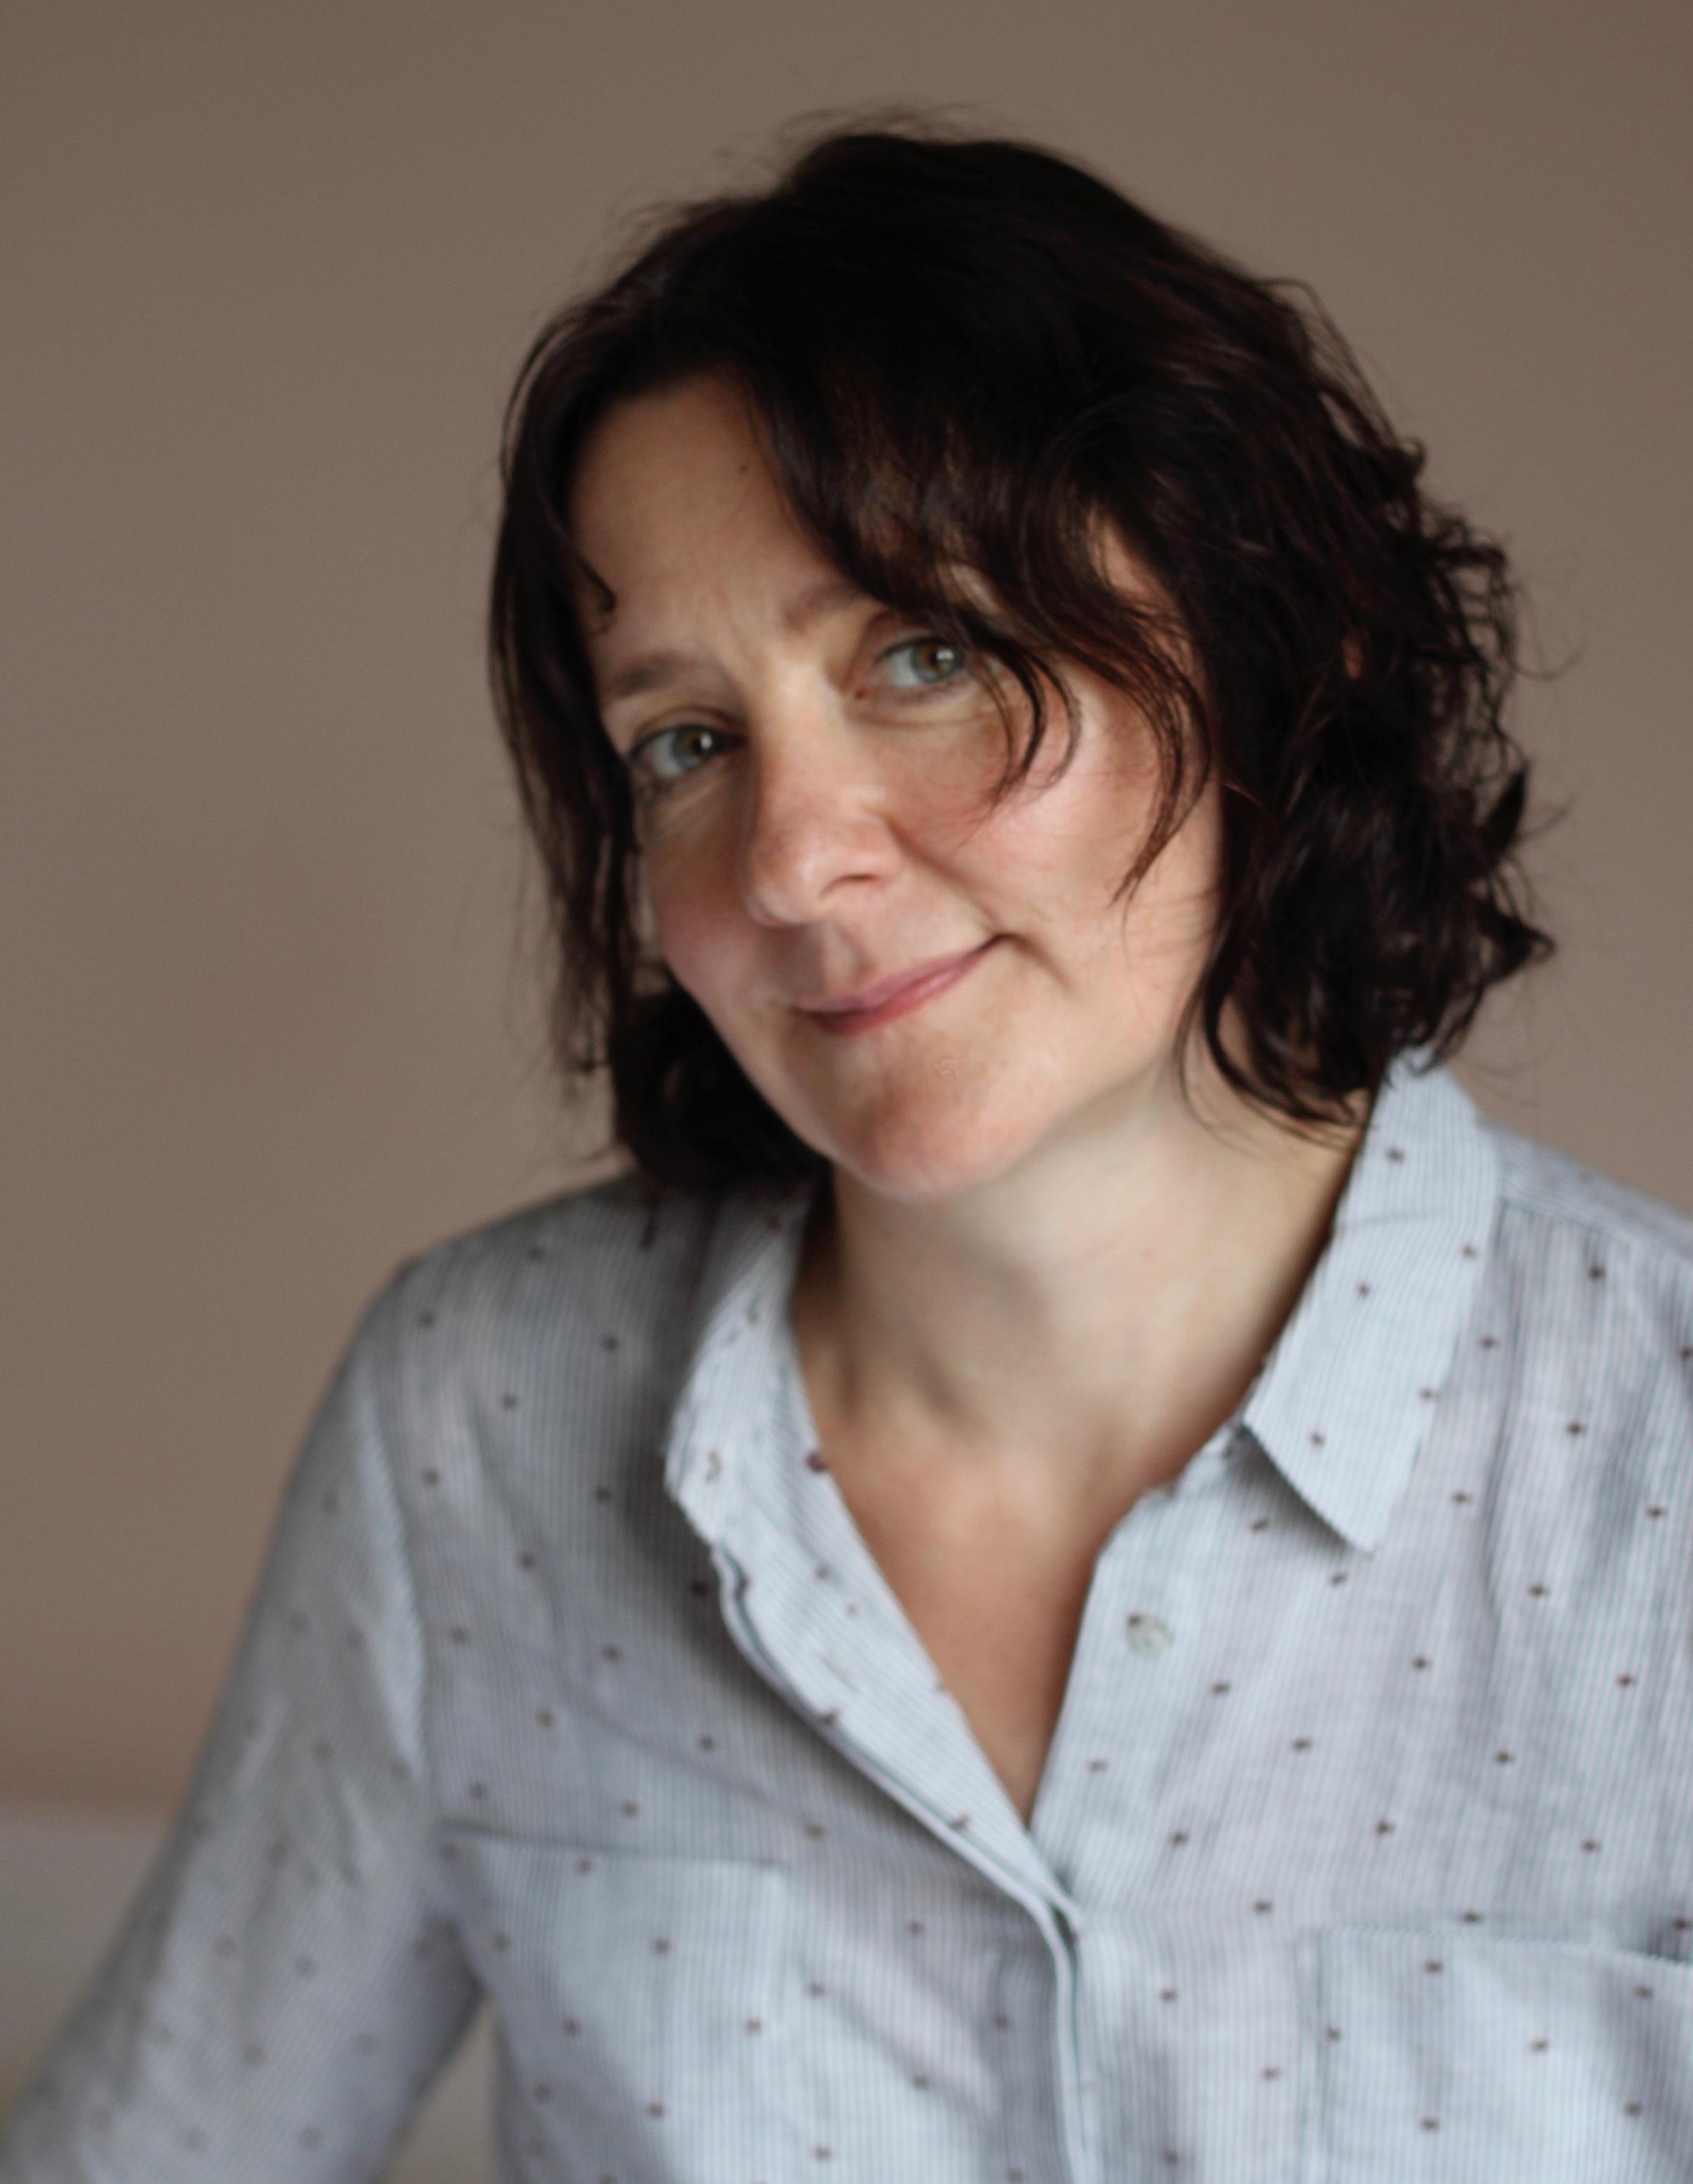 Award-winning Northern Irish poet heads to festival